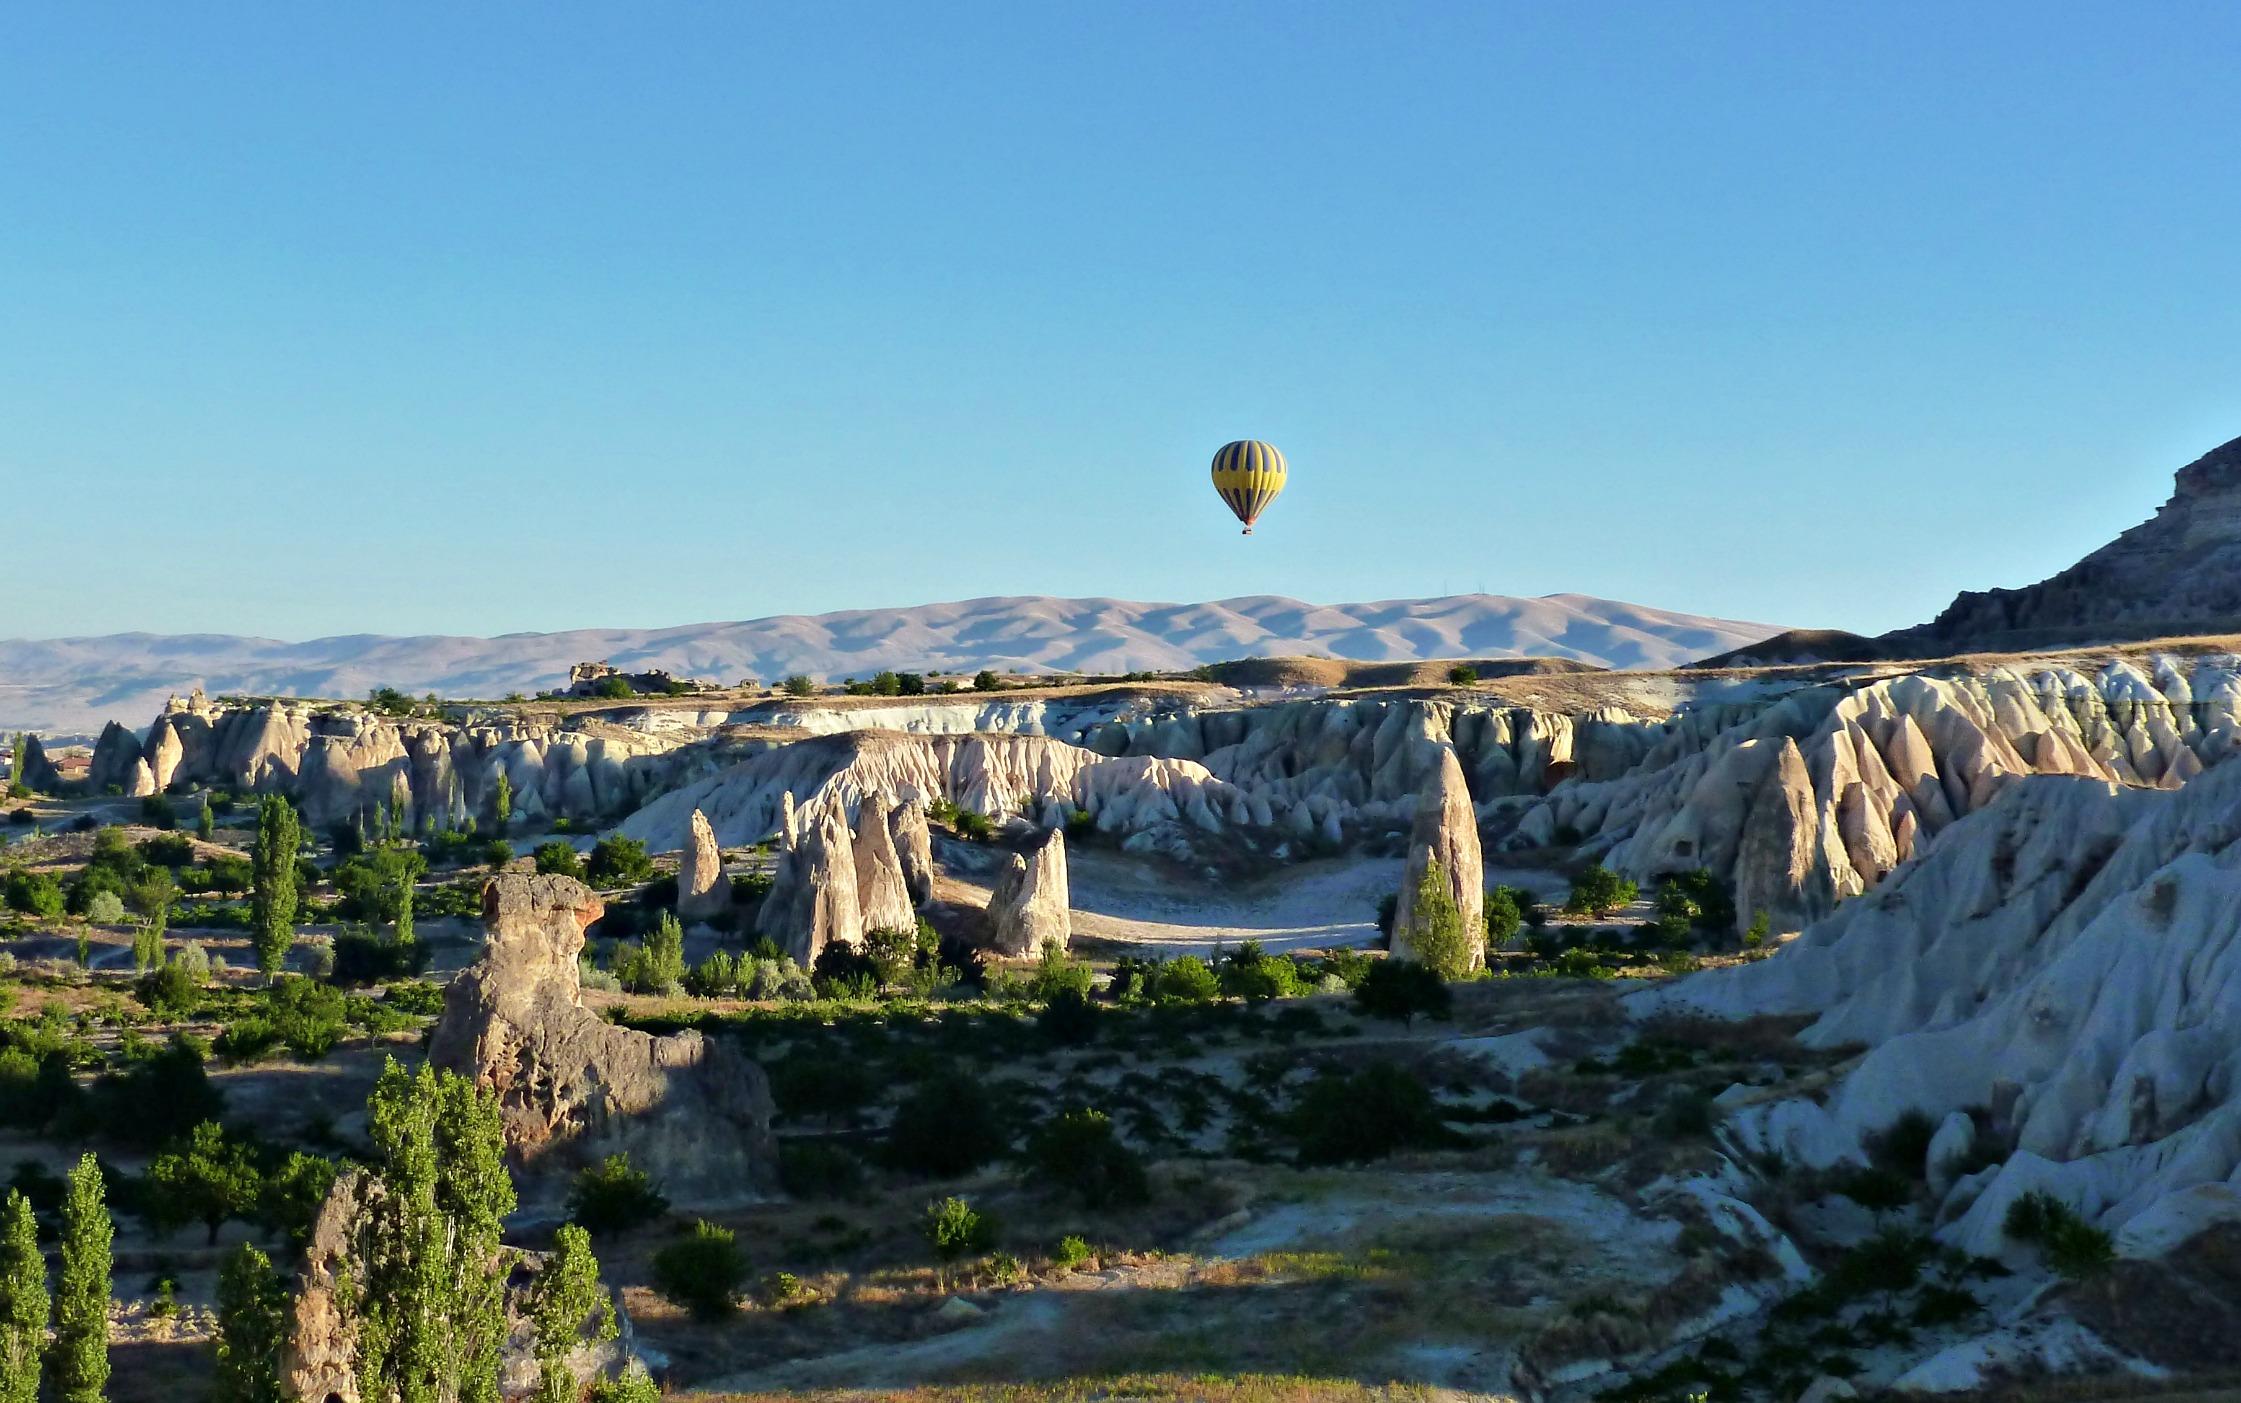 Ballooning in Kapadokya, Turkey